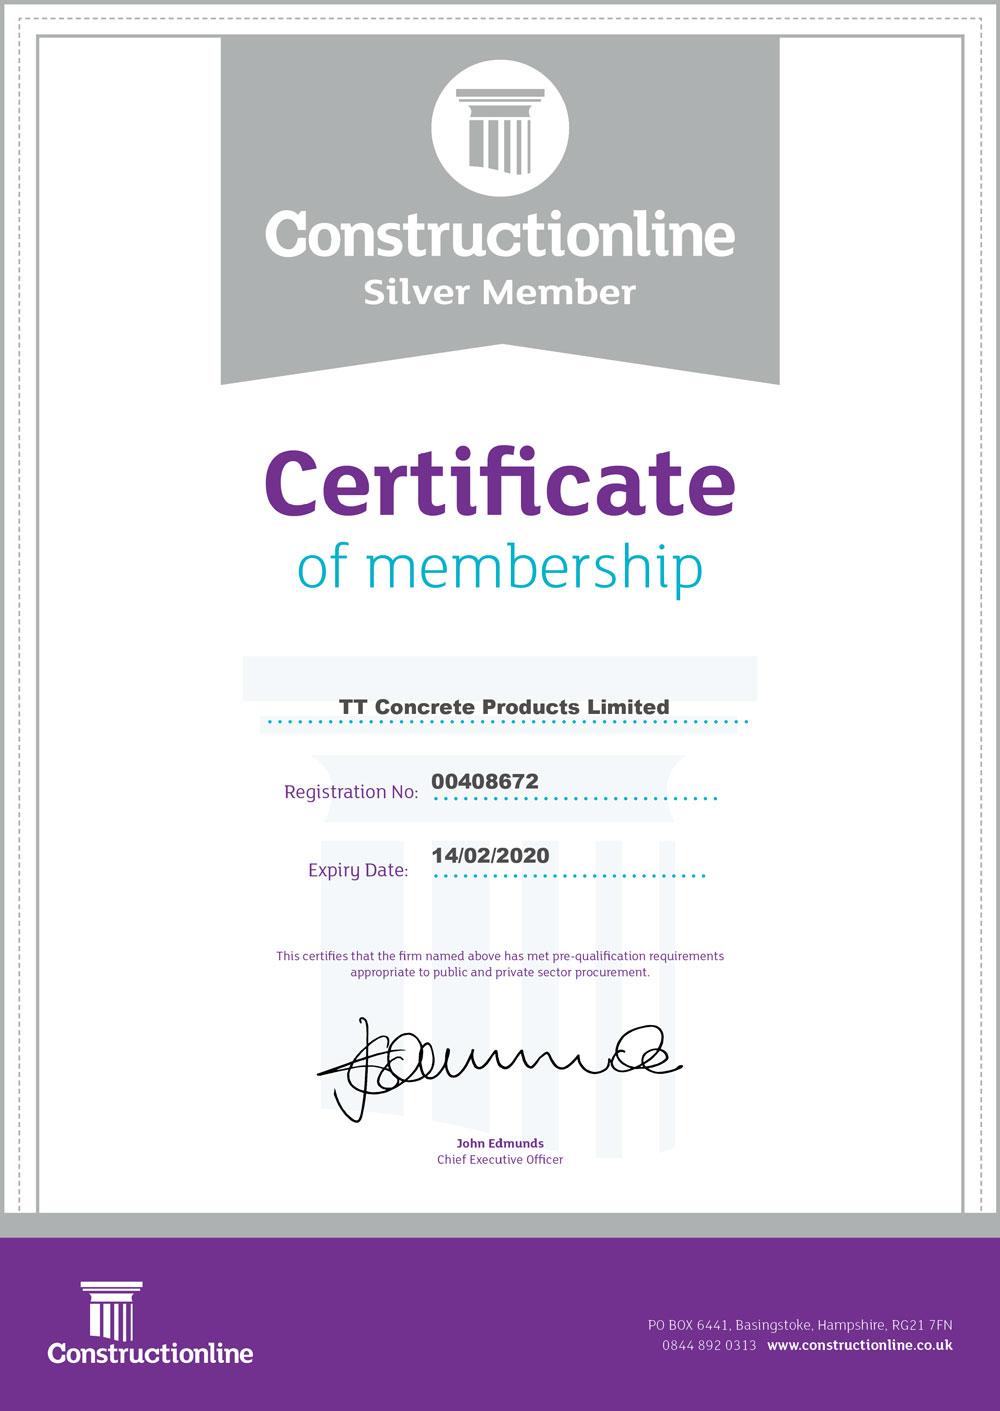 ConstructionLine Member Certificate